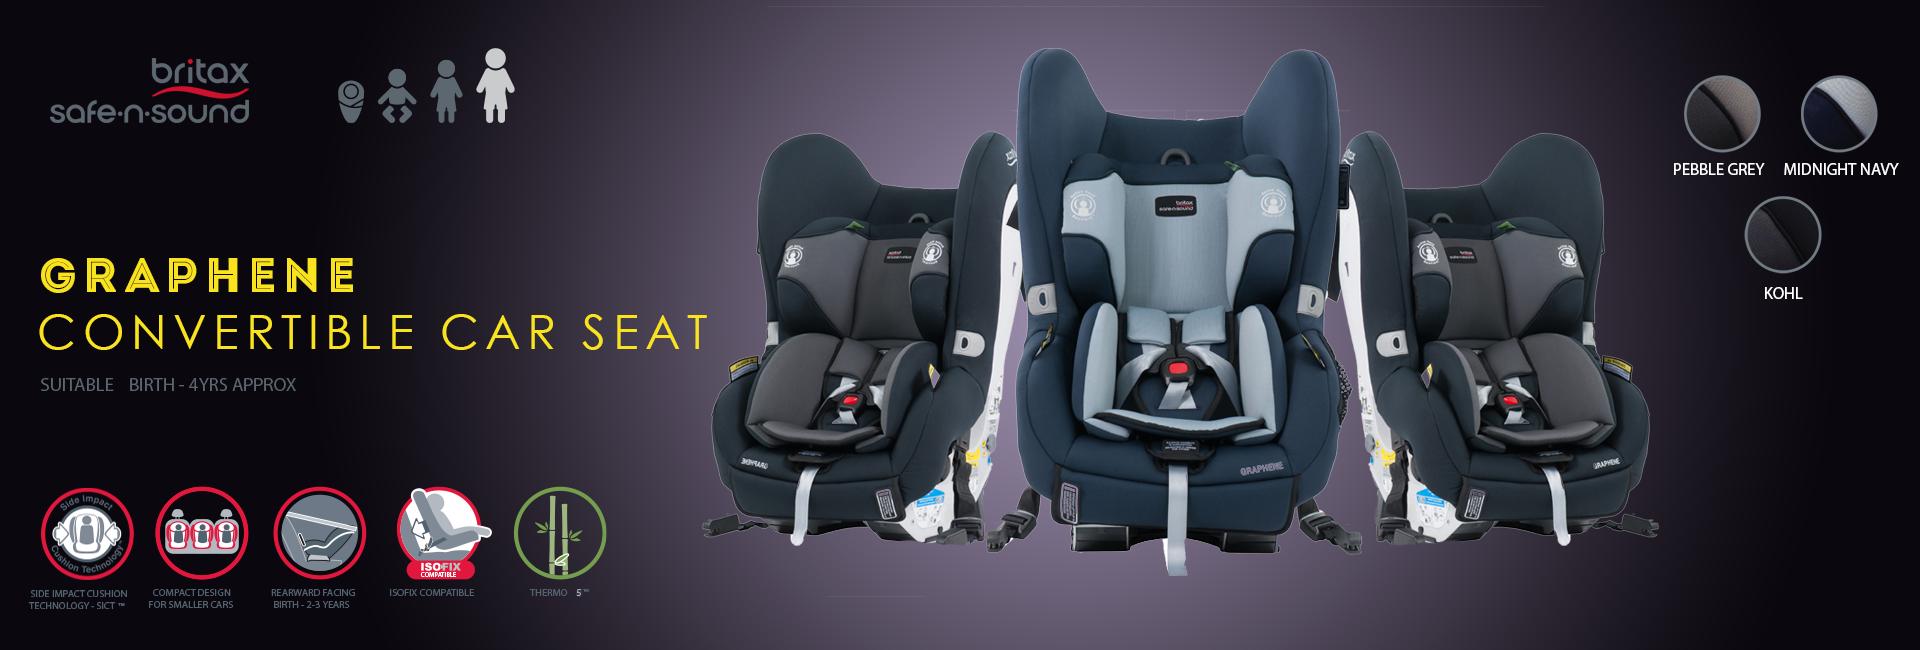 Britax Safe n sound Graphene Convertible Car Seat